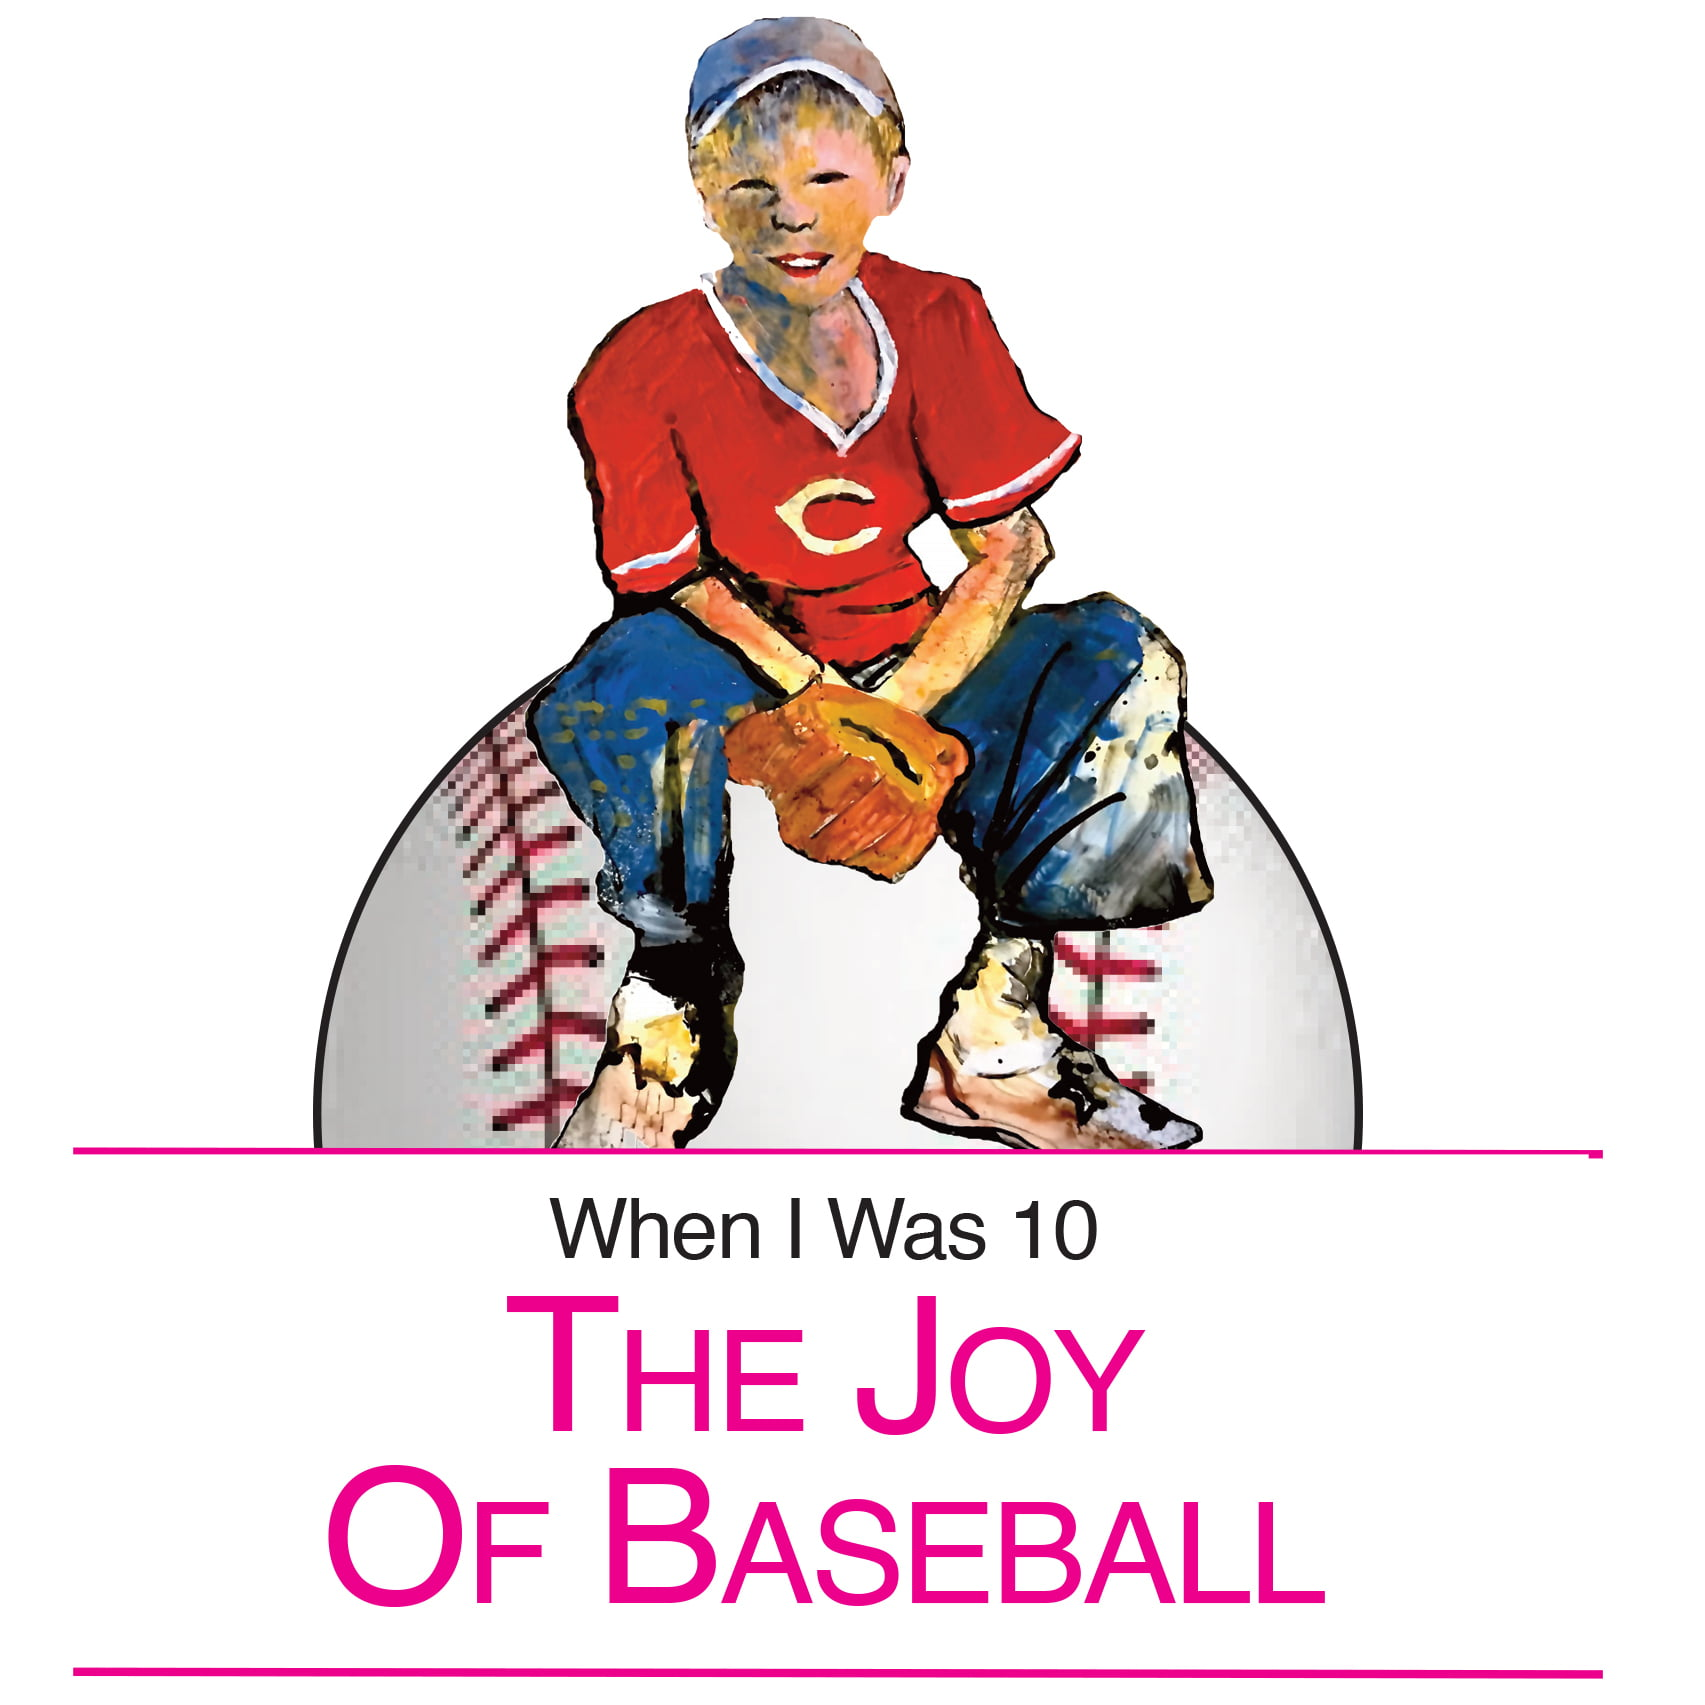 Alan Braley: The Joy of Baseball